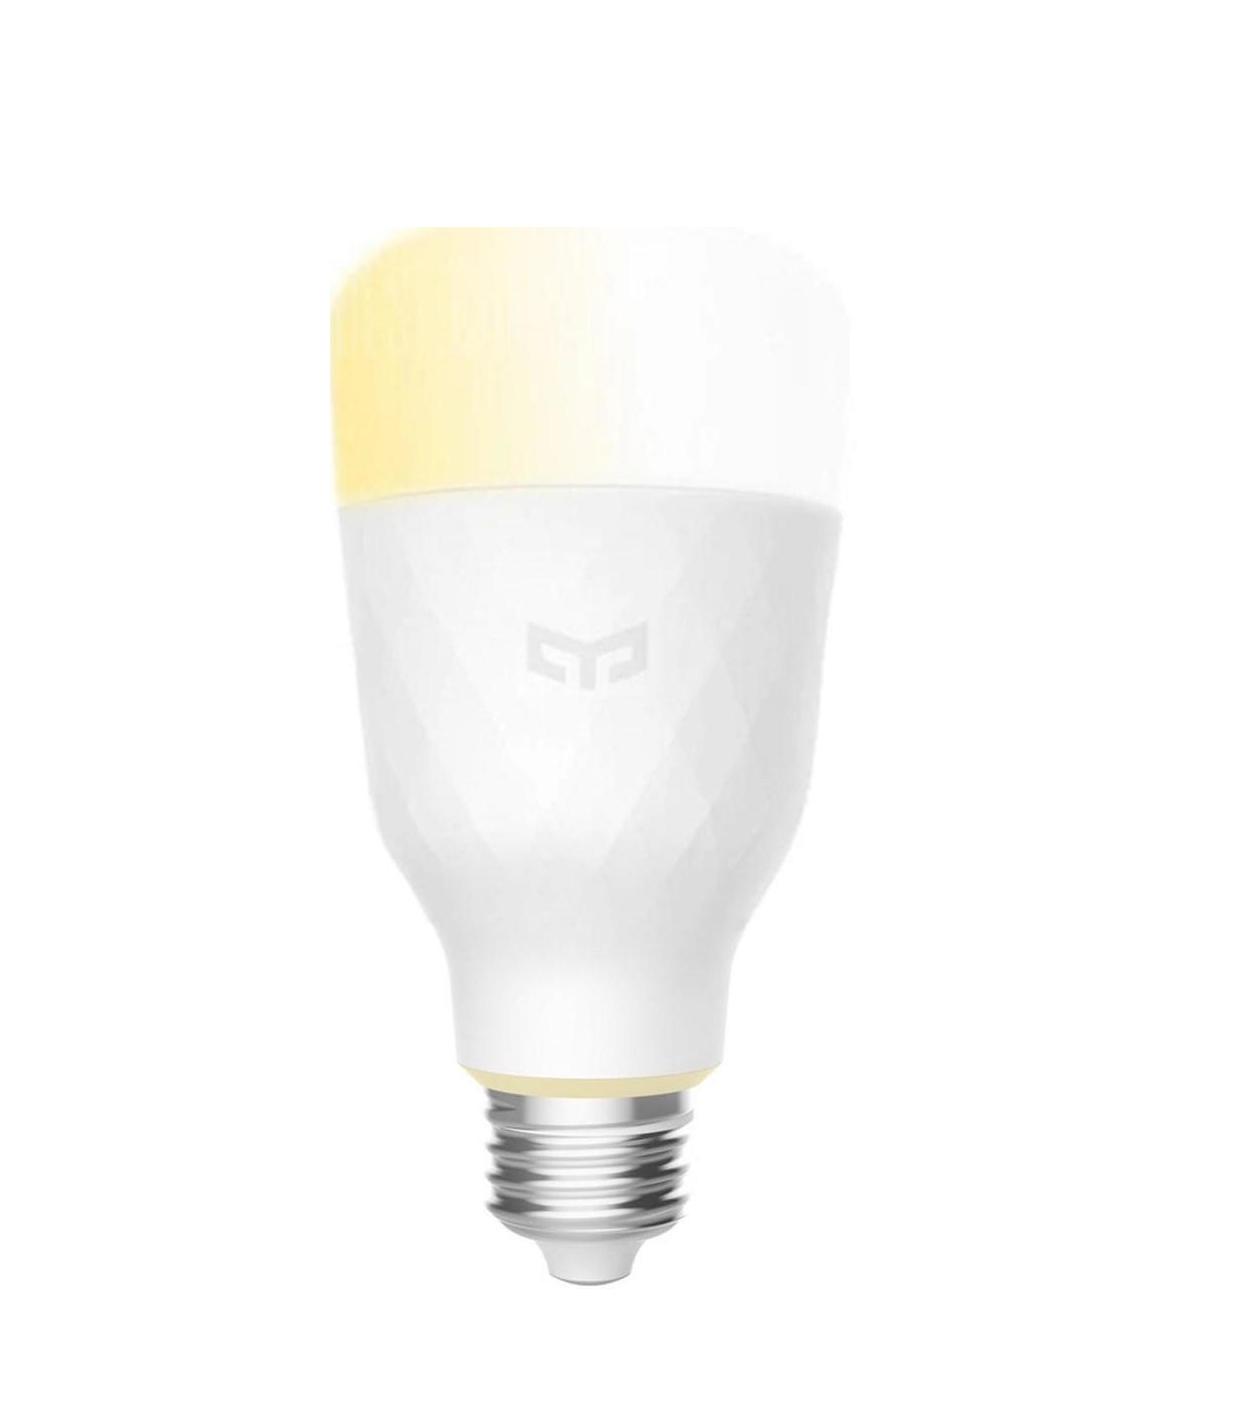 Xiaomi Yeelight E27 Bulb 10W Ρυθμιζόμενο Λευκό Smart  Έξυπνη Λάμπα YLDP05YL